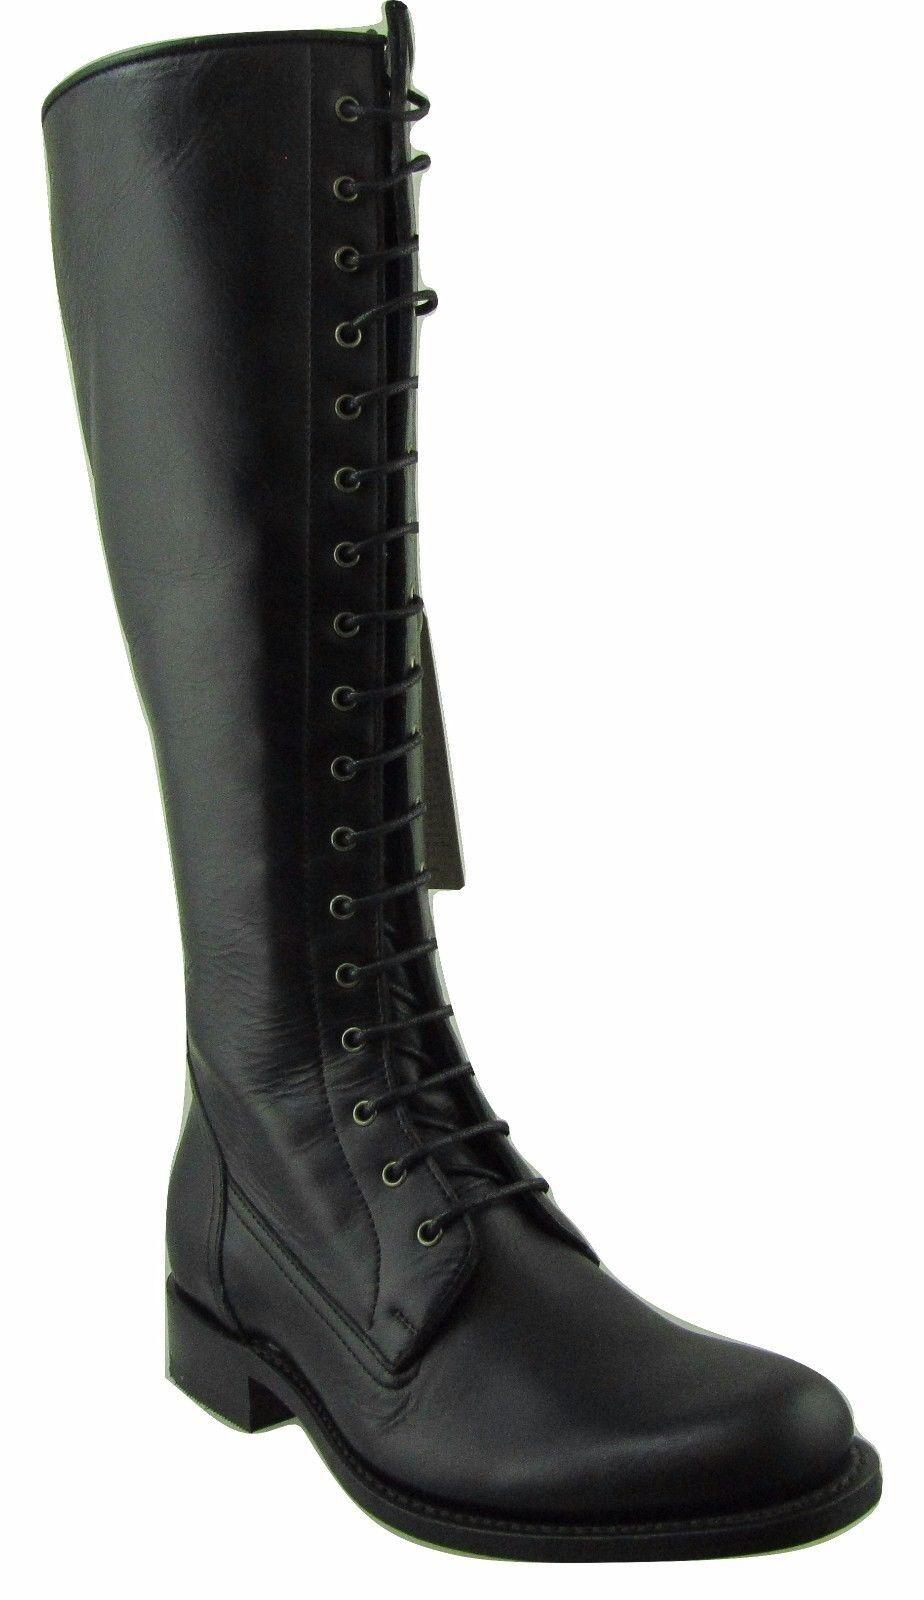 Sendra 7277 Cowboy Cowboy Cowboy Boots Black Leather Western Biker Handmade Ladies Lace Up bef9ca